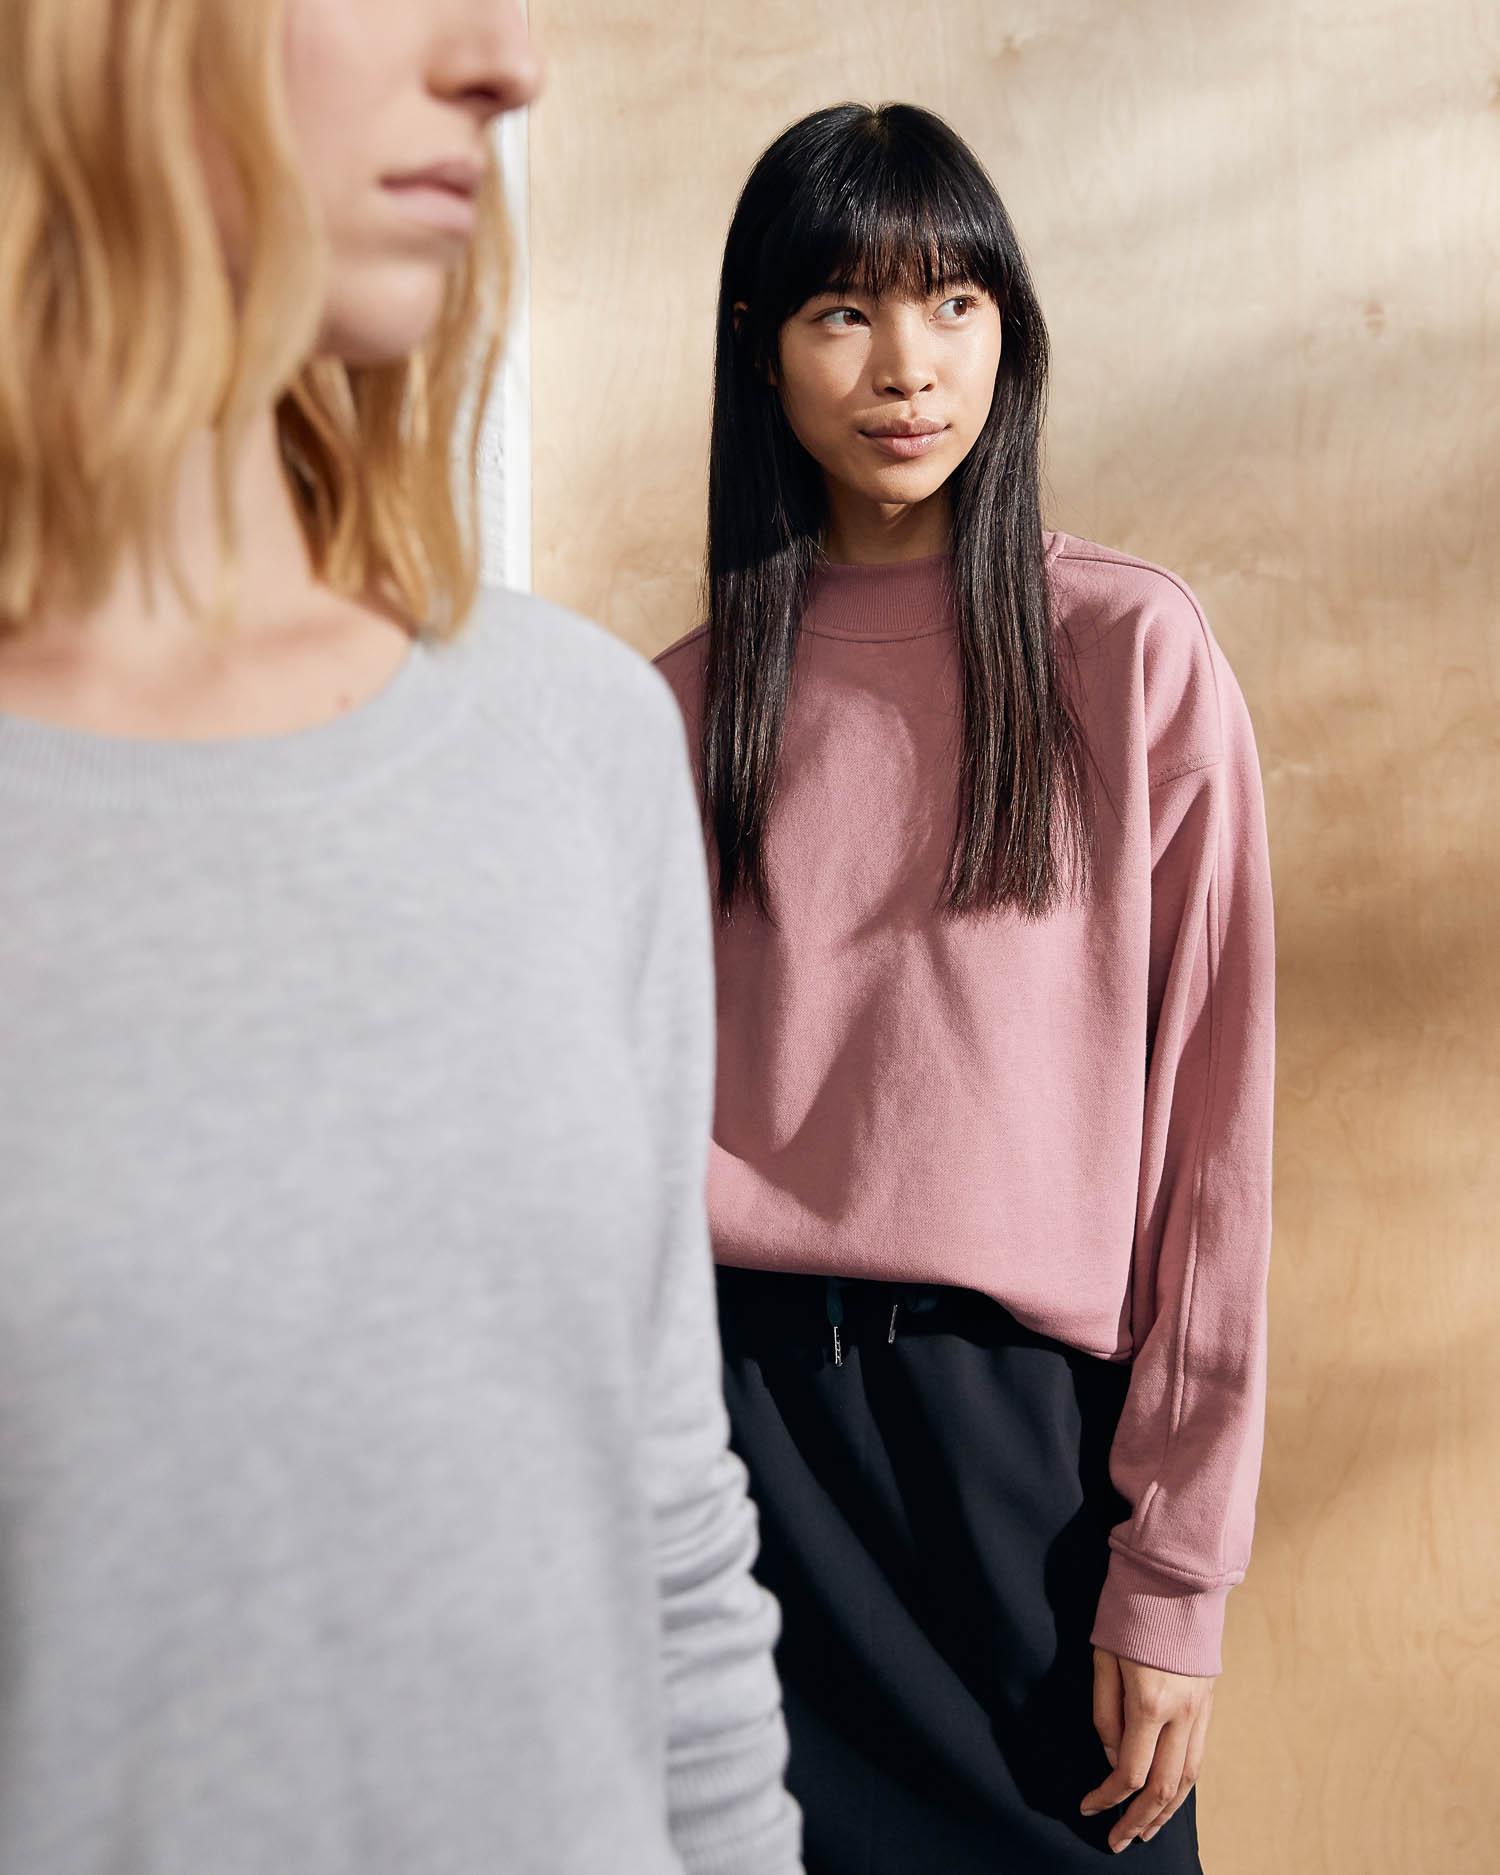 Diane-Chiu-and-Miriam-for-lululemon-sweaters-33679-MK-Matt-Korinek-Photography-Copyright-2019-SQSP-1500px.jpg